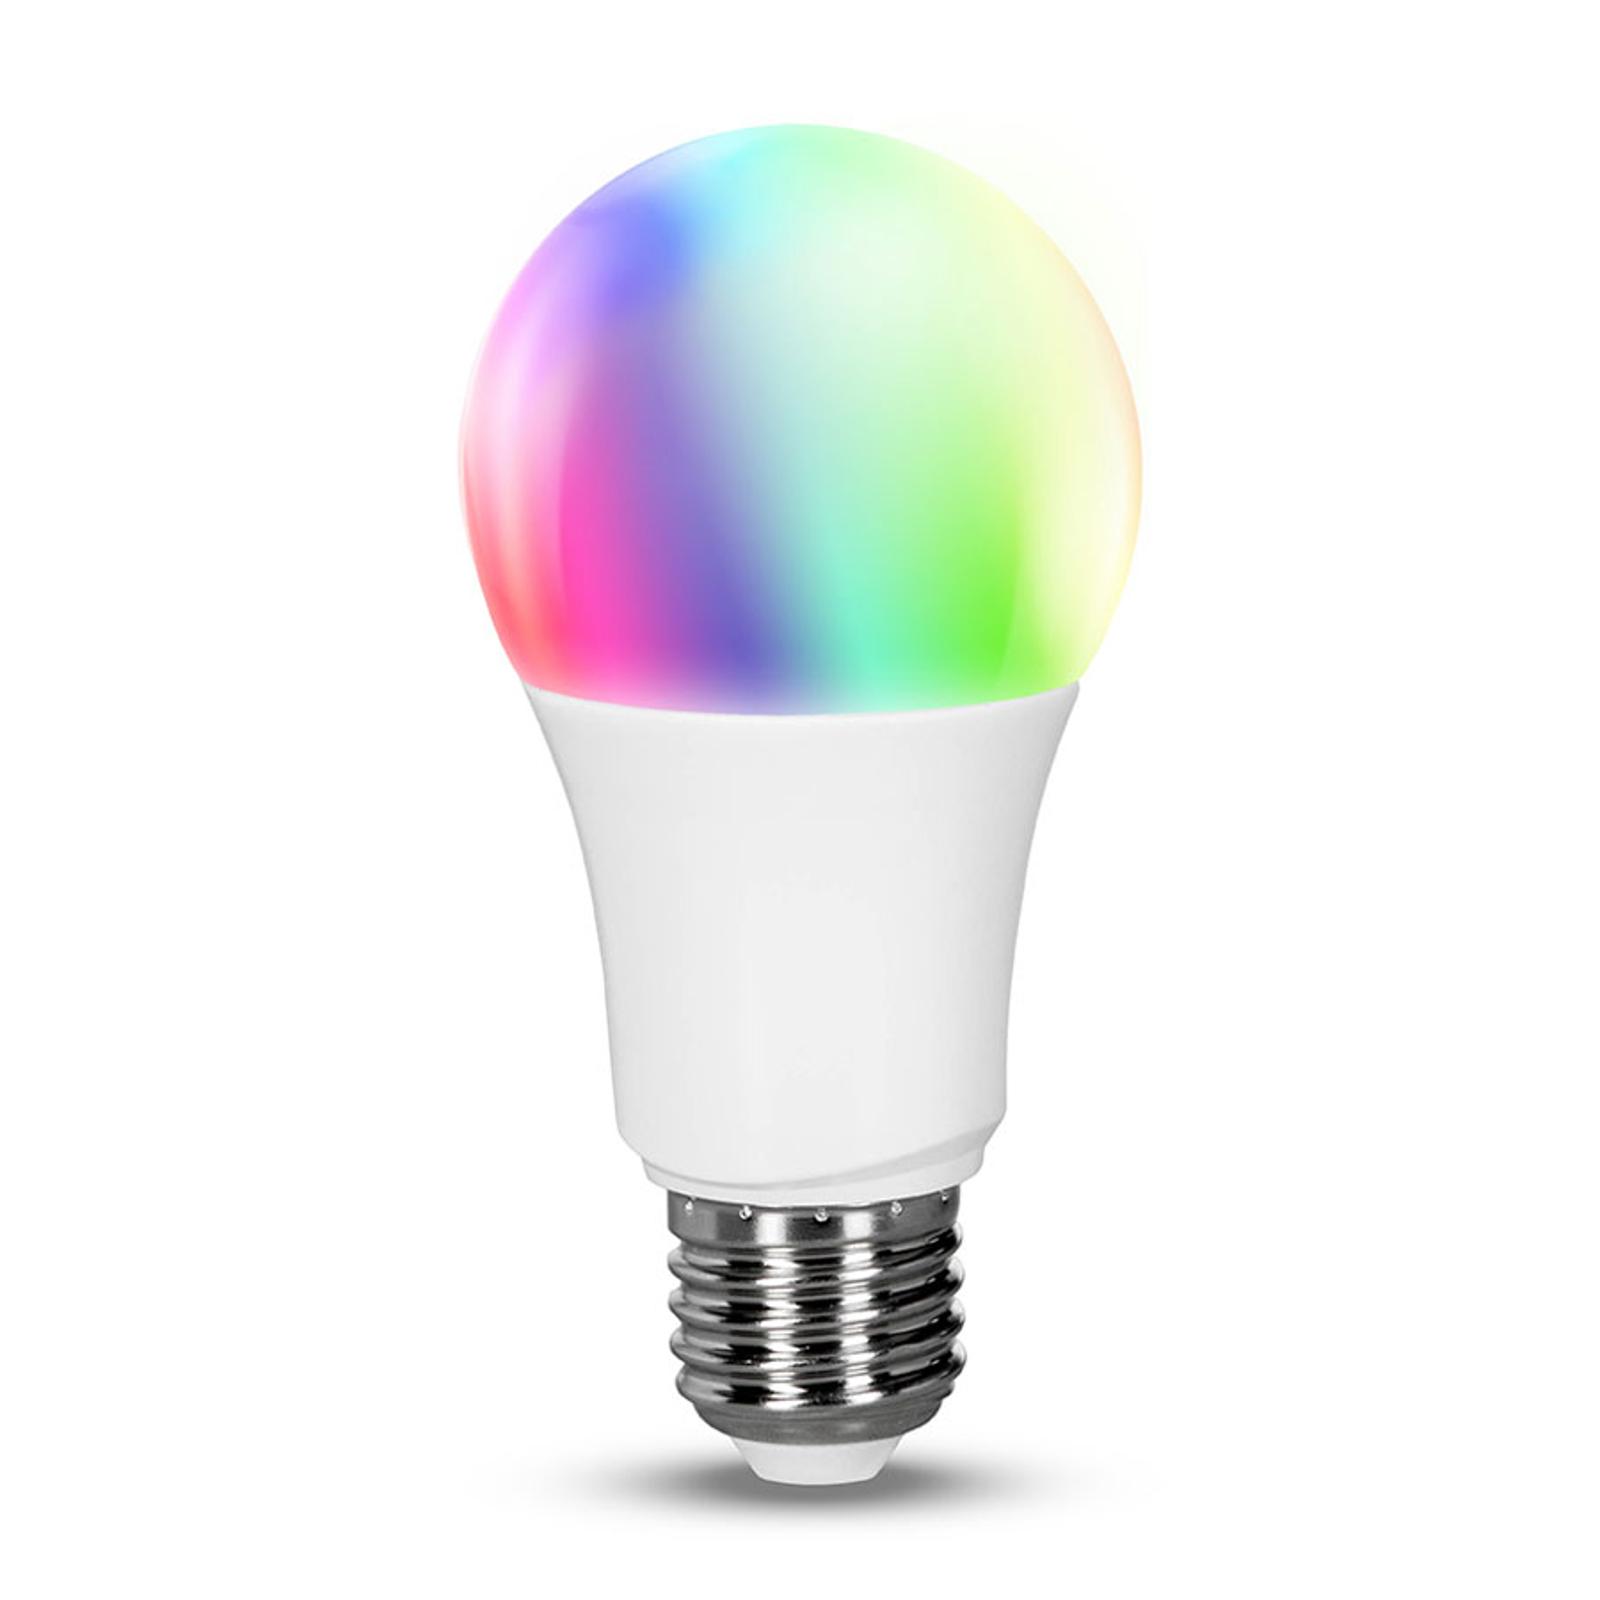 Müller Licht tint white+color LED-pære E27 9,5W